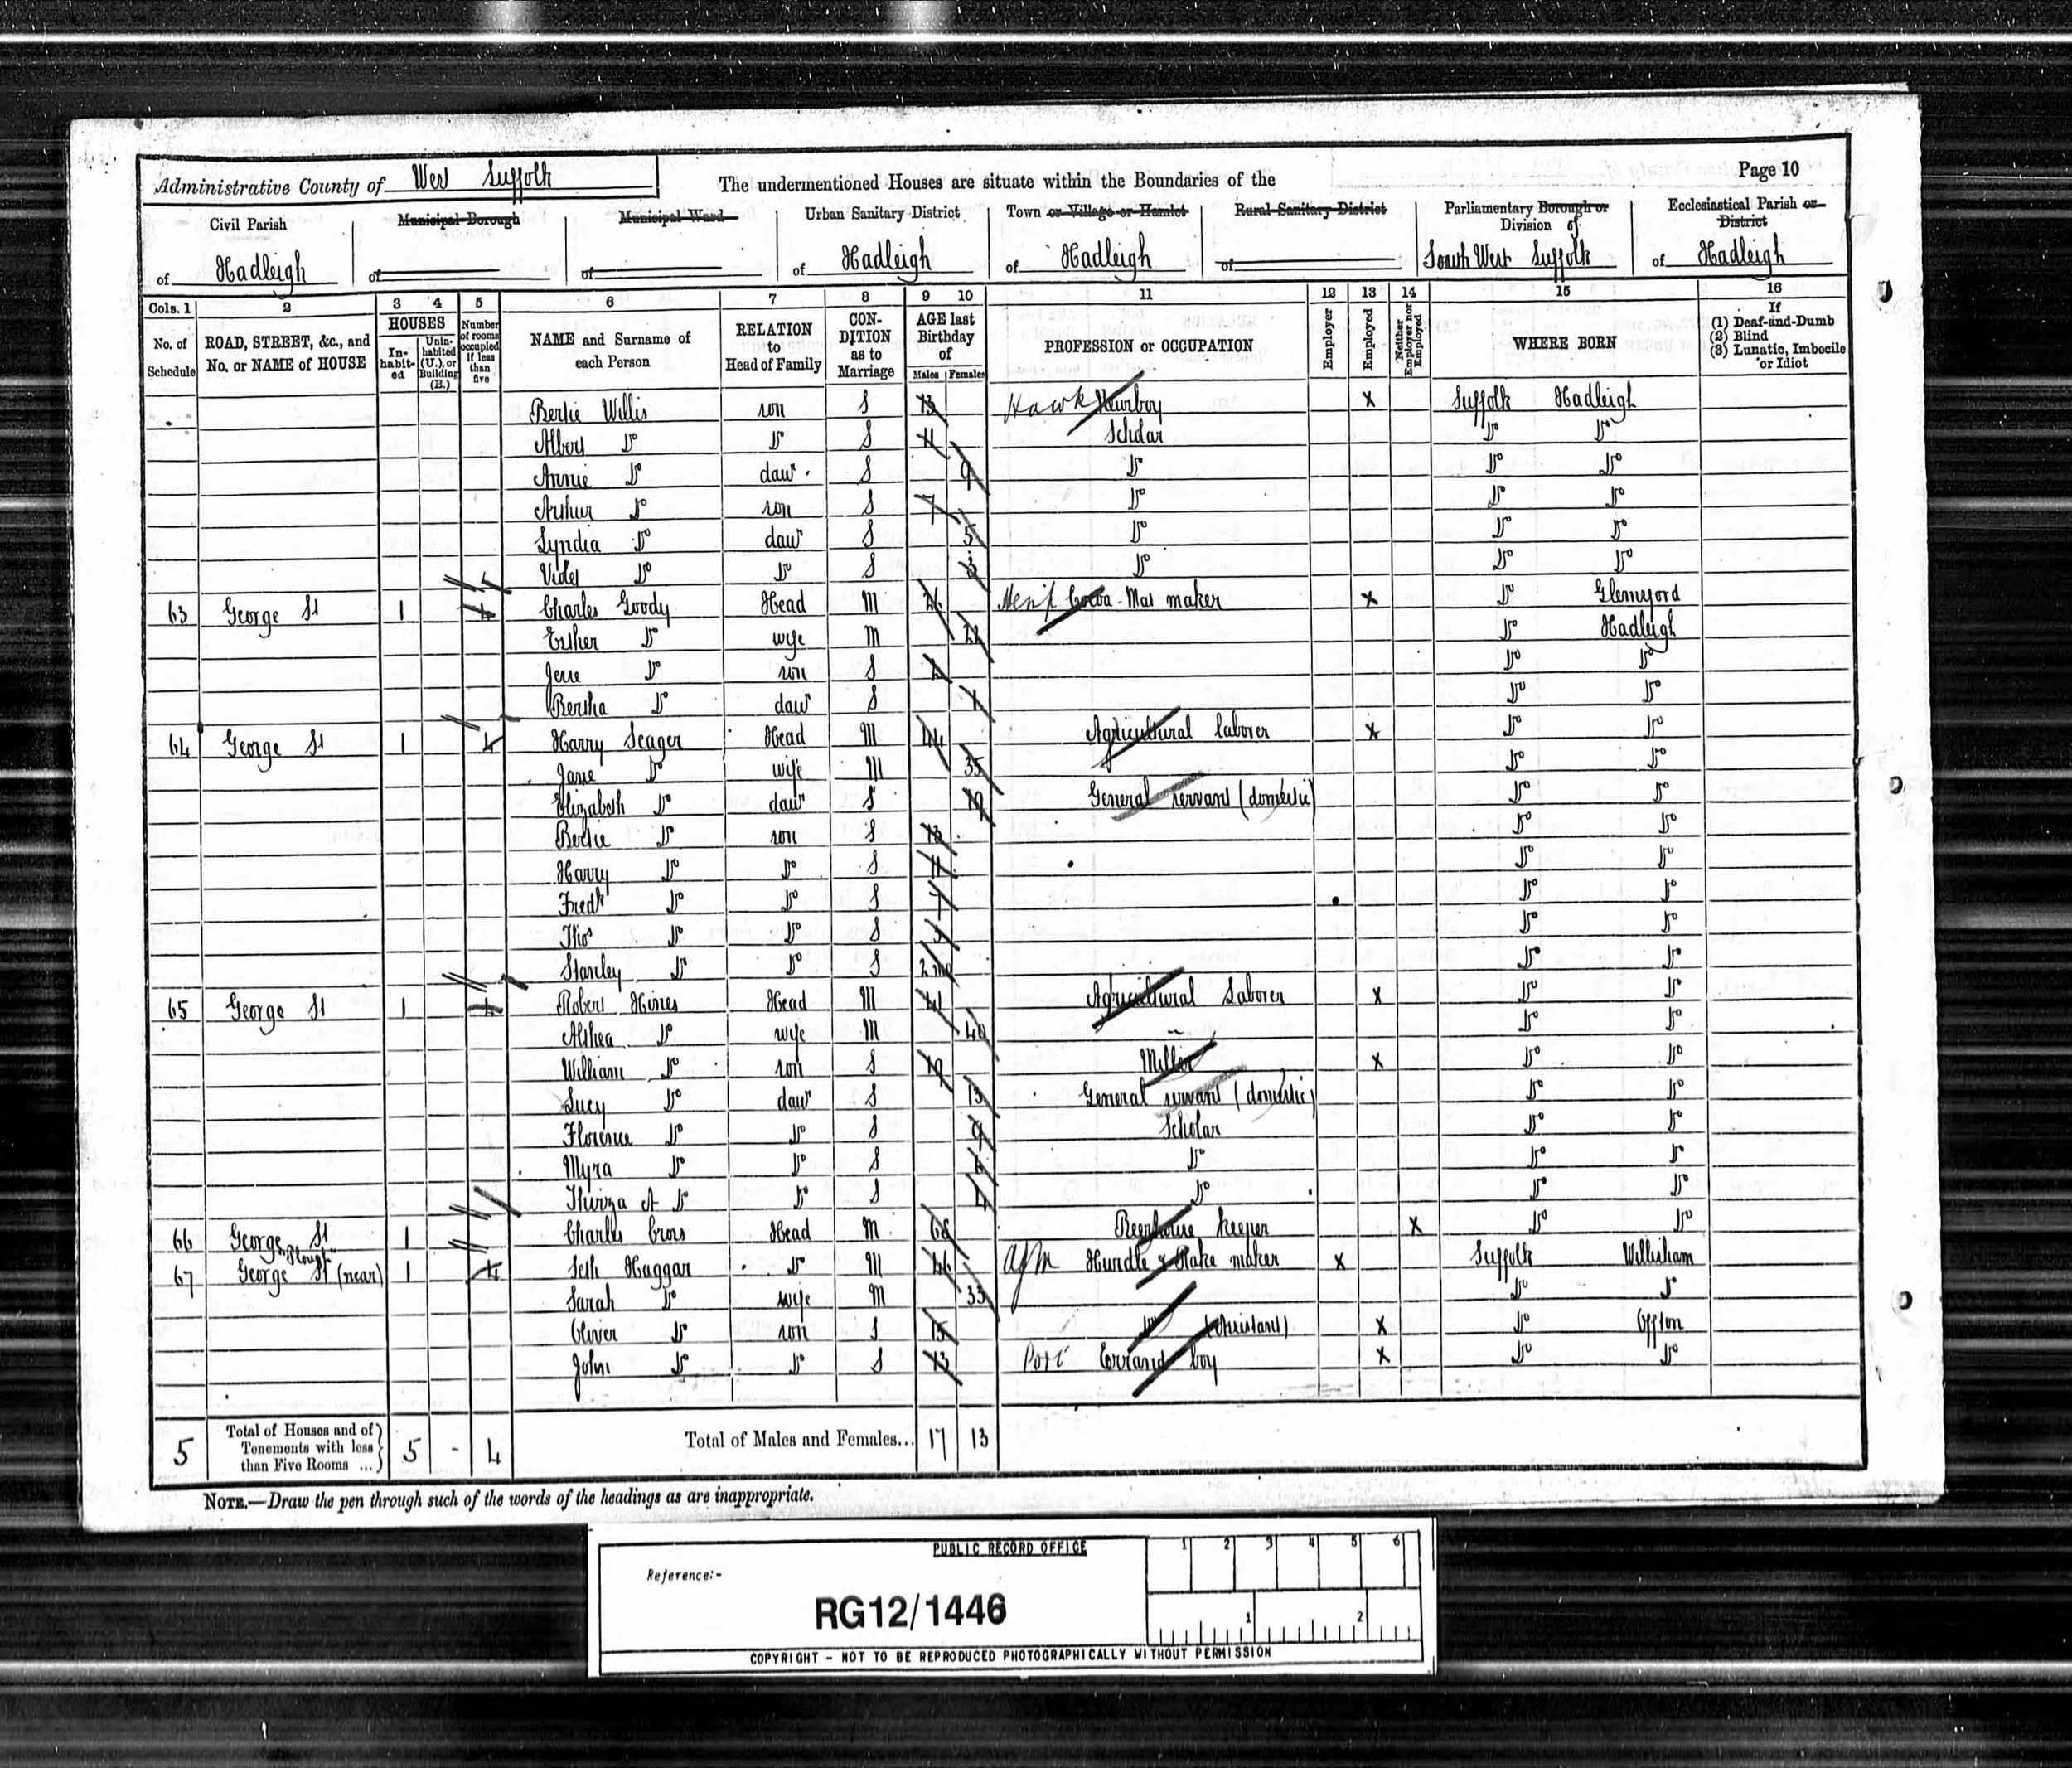 Goody Jesse 1901 census.jpg